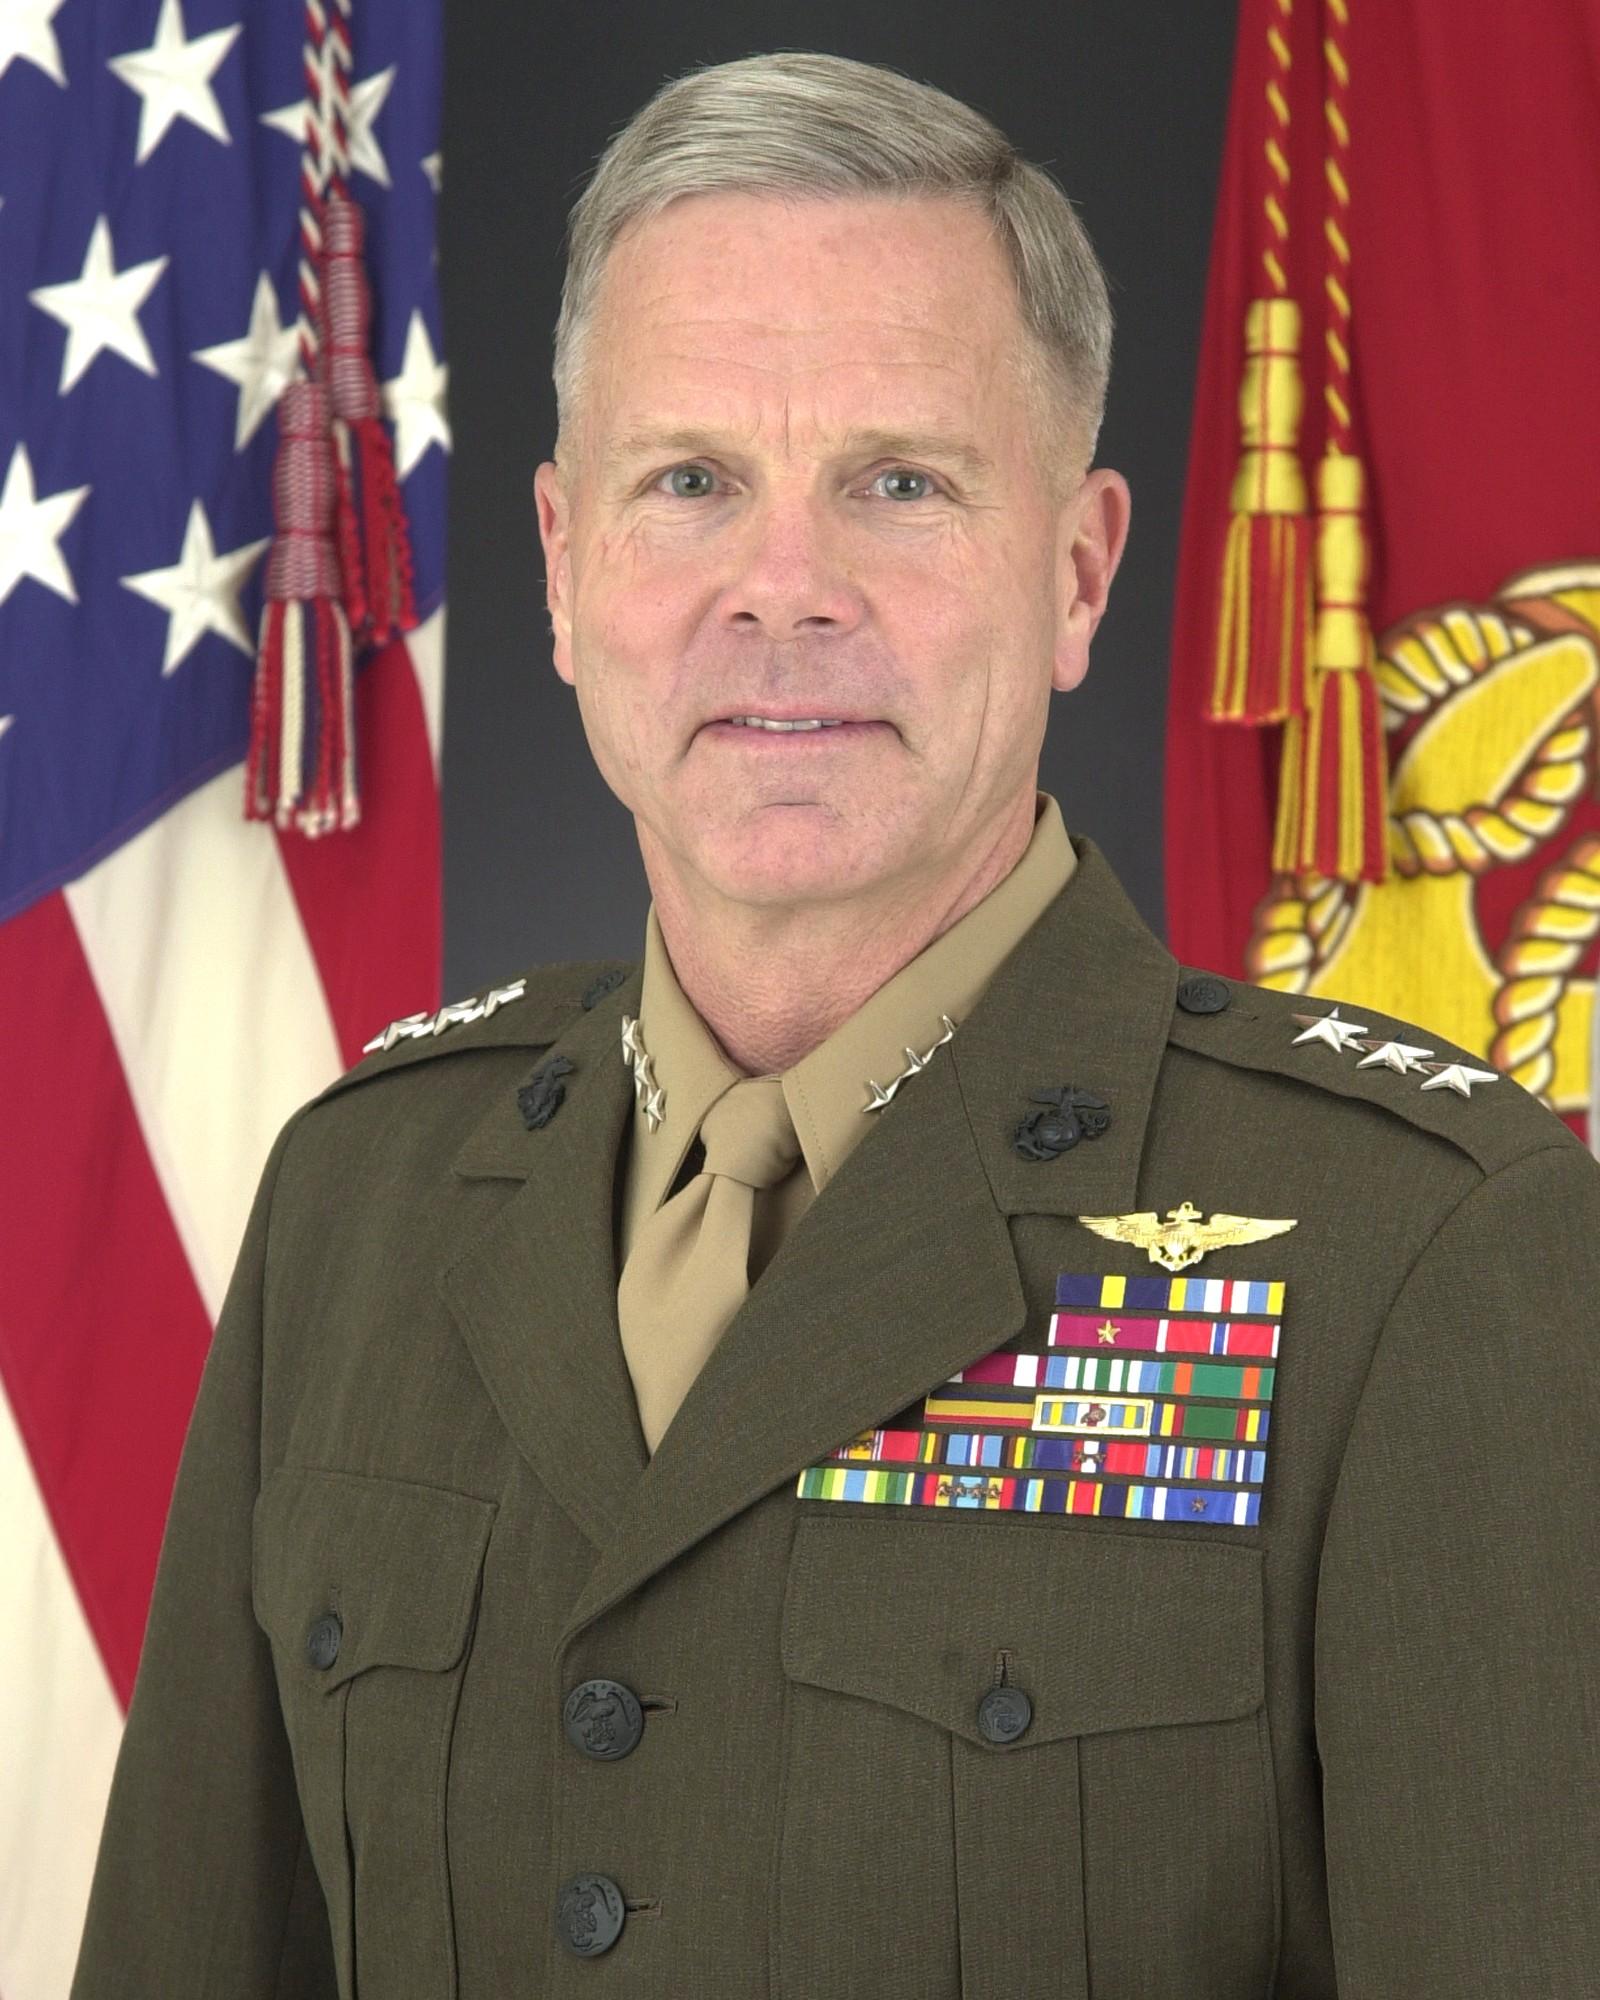 Marine Corps Uniform Board  hqmcmarinesmil